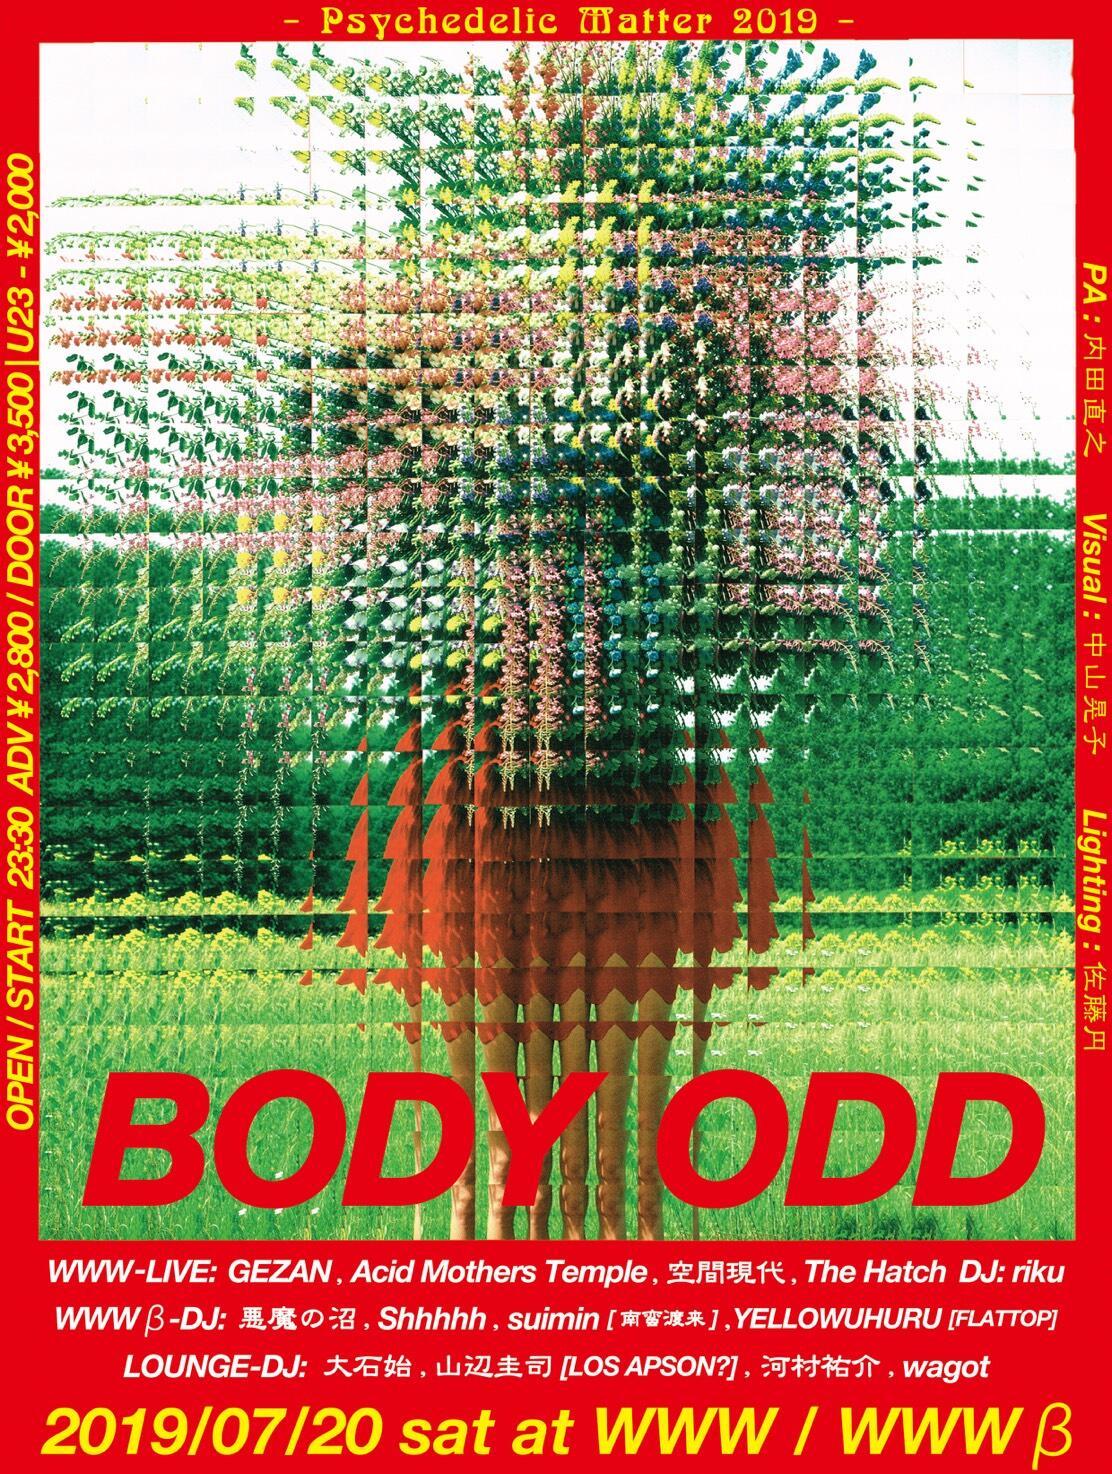 GEZAN / Acid Mothers Temple & The Melting Paraiso U.F.O. / 空間現代 / The Hatch / riku / 中山晃子 / 悪魔の沼 (Compuma / Dr.Nishimura / Awano) / Shhhhh / suimin / YELLOWUHURU / 大石始 / 山辺圭司 [LOS APSON?] / 河村祐介 / wagot